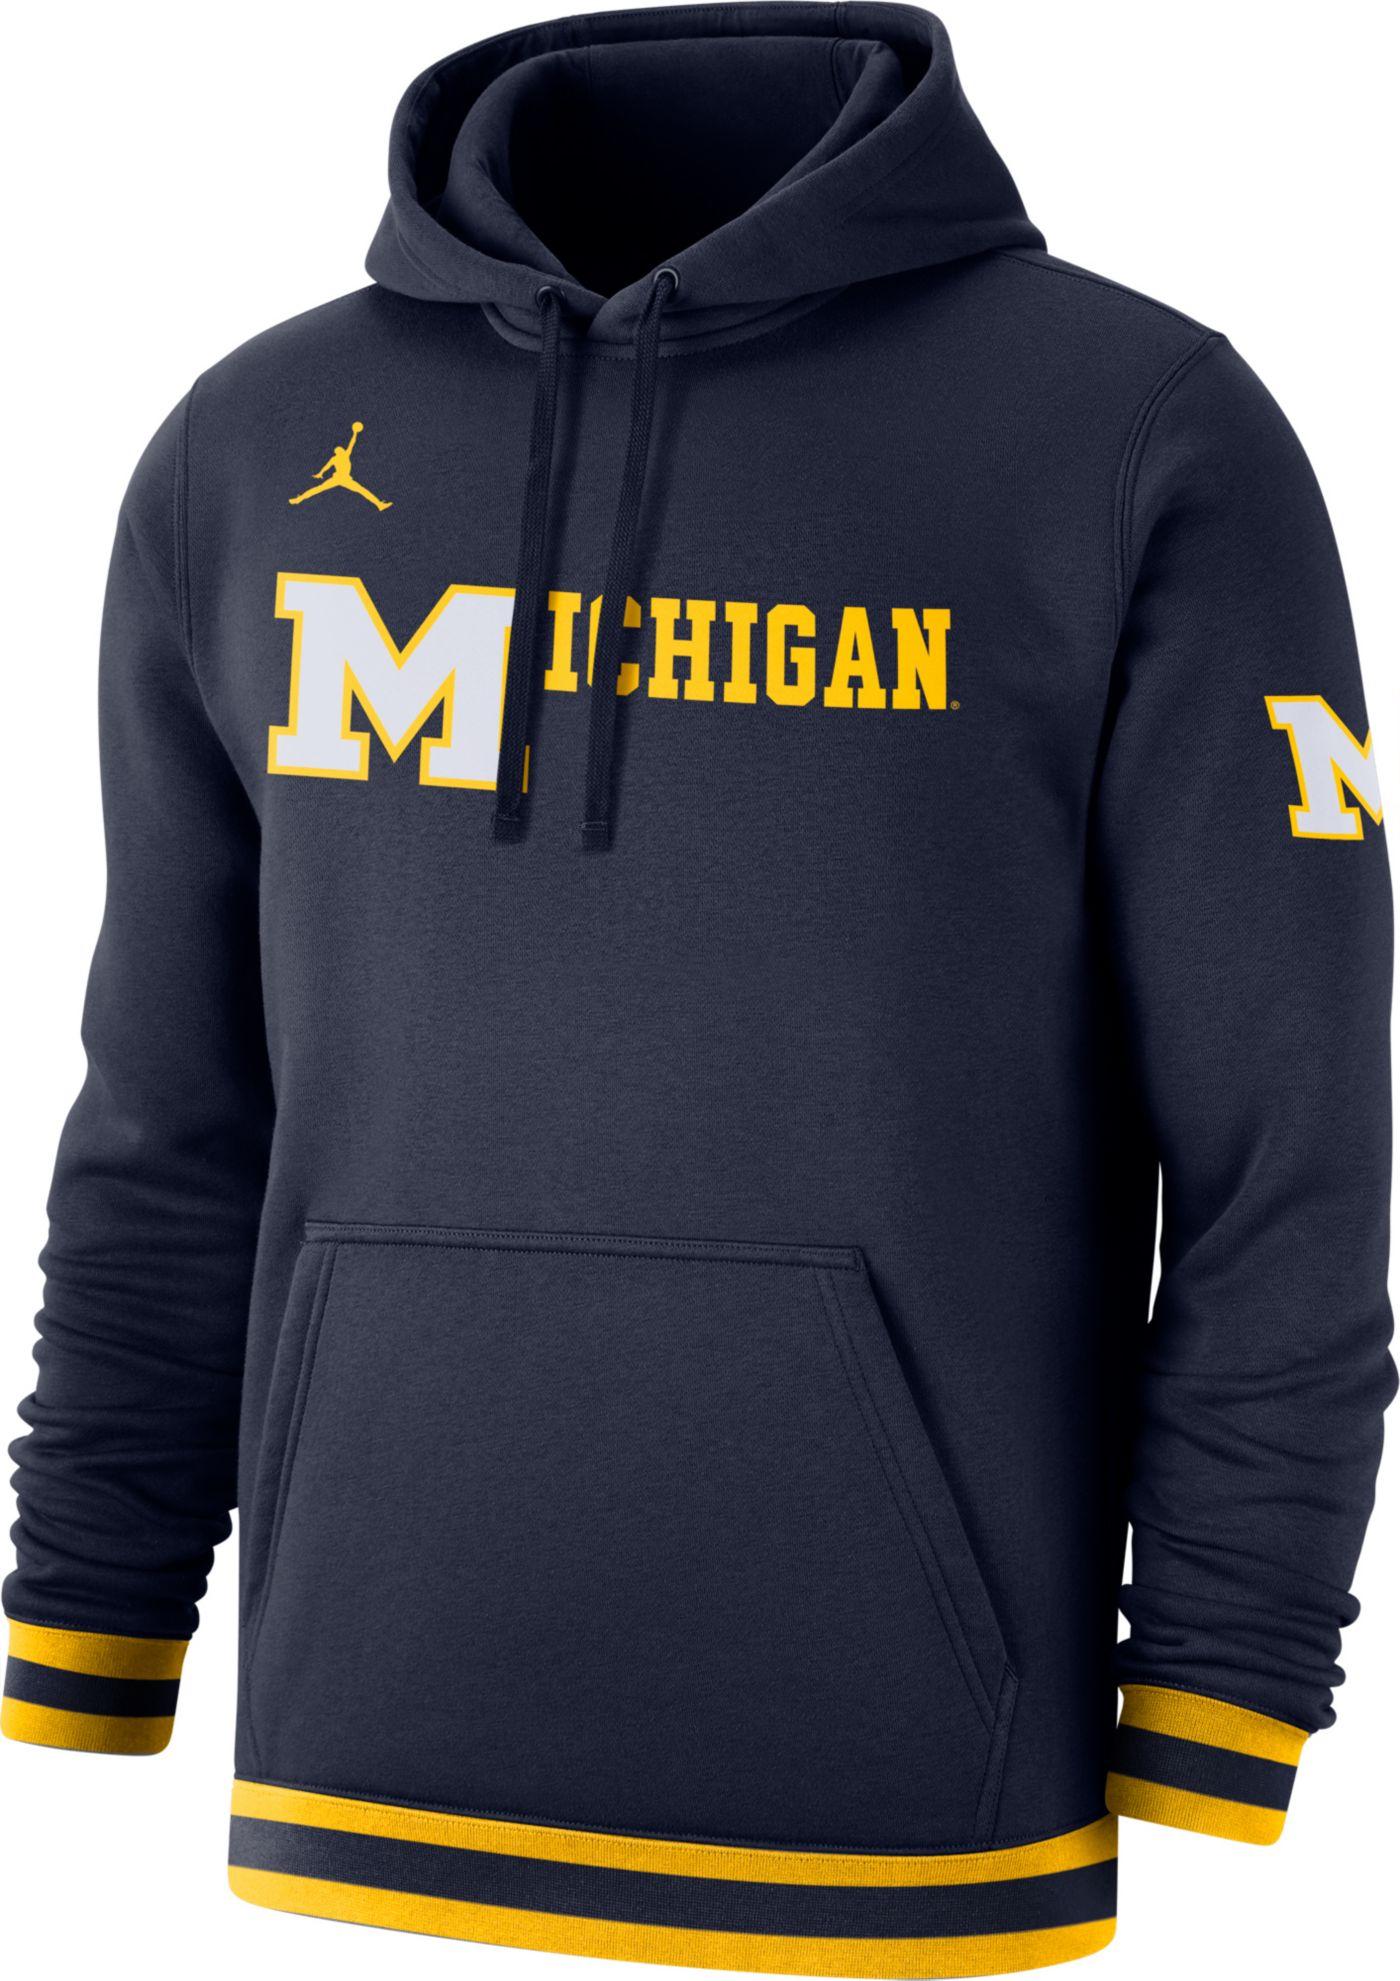 Jordan Men's Michigan Wolverines Blue Club Retro Hoodie